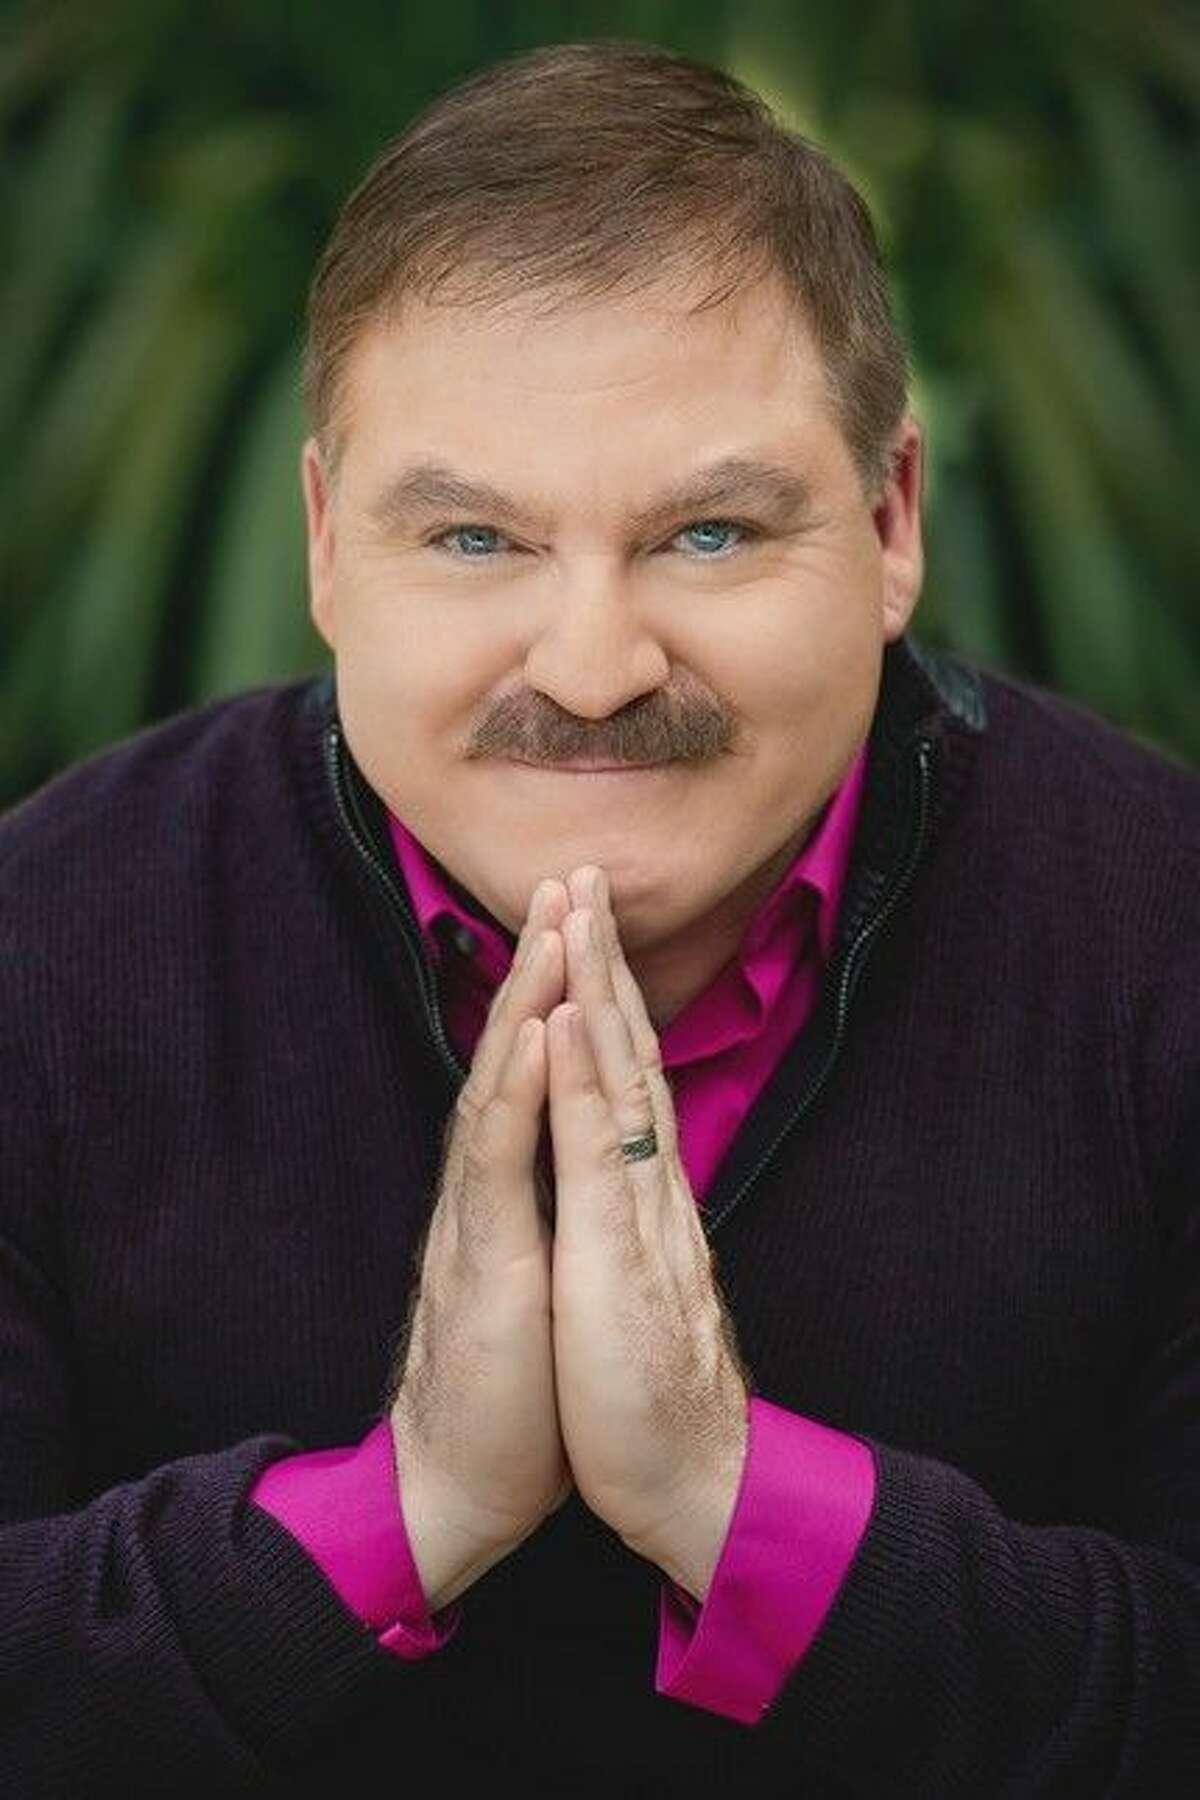 Spiritual medium James Van Praagh's